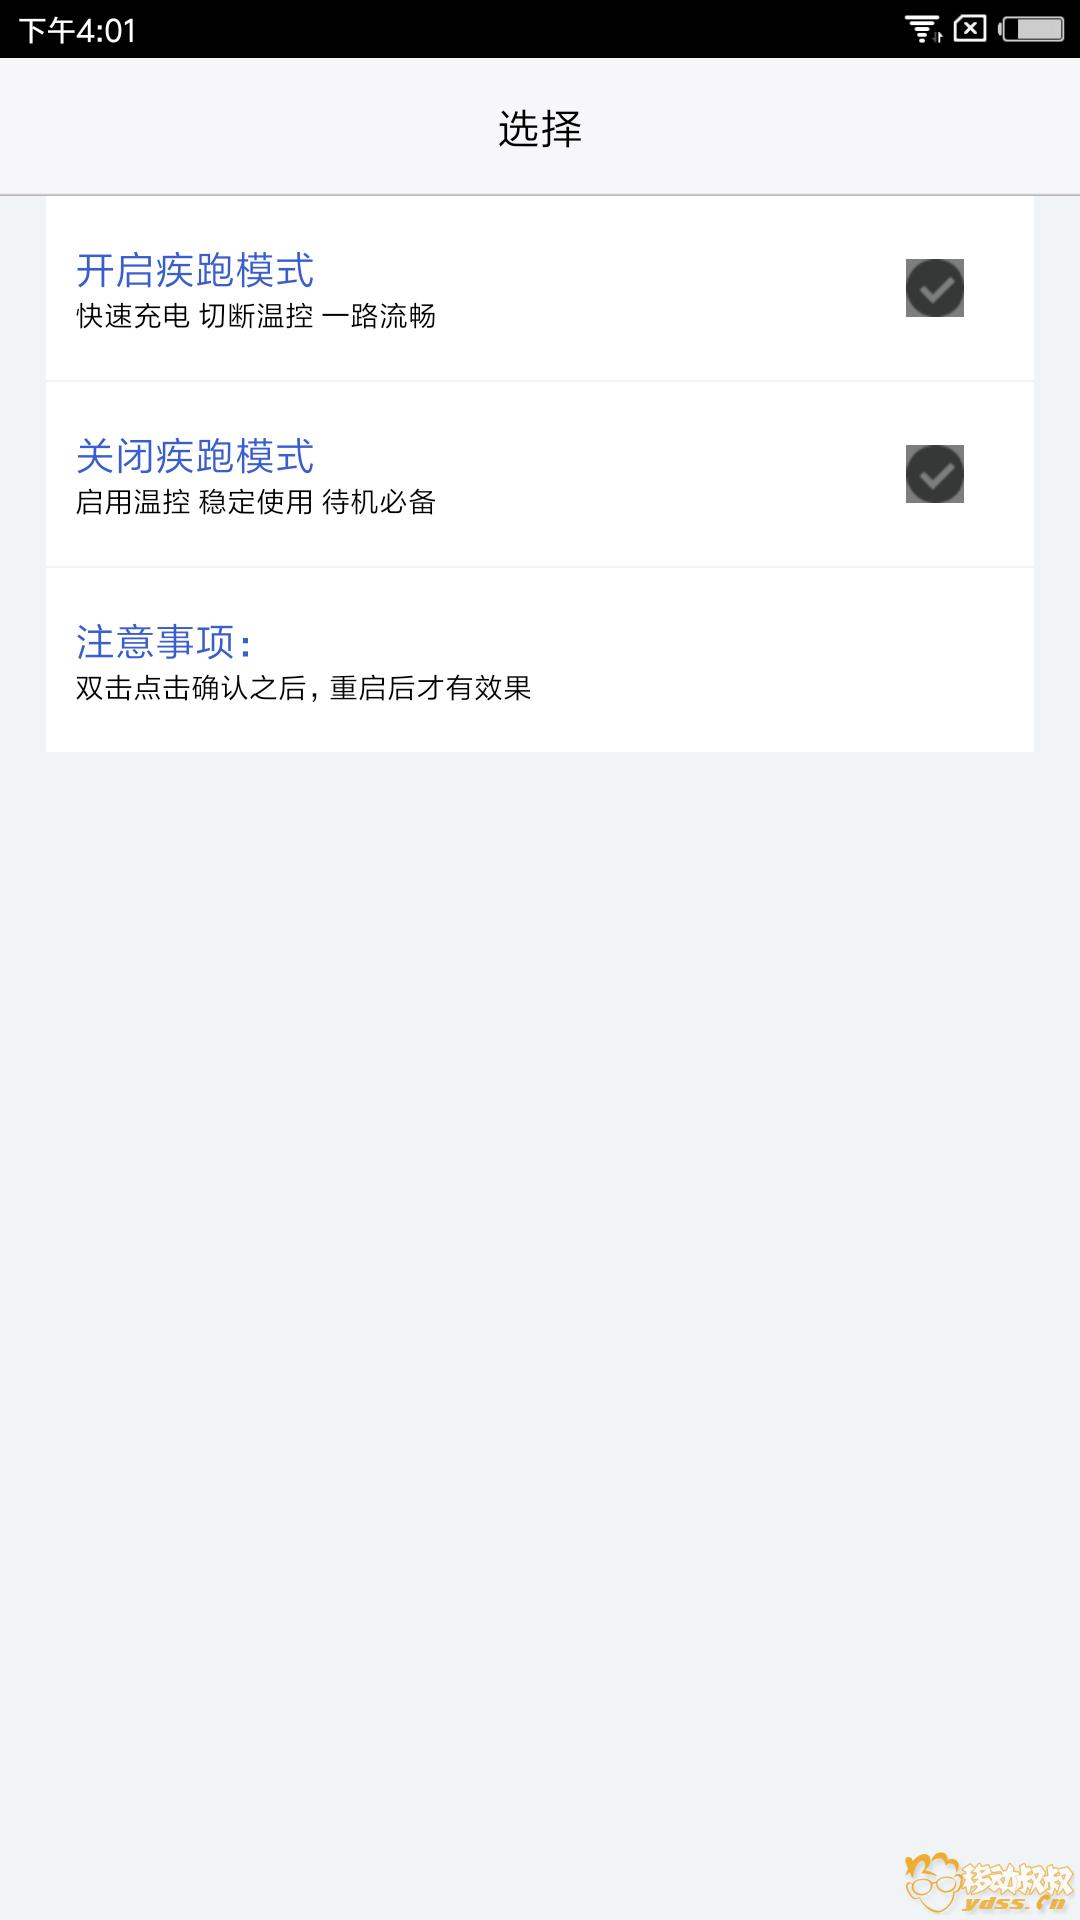 Screenshot_2018-04-10-16-01-20-841_com.pingfan.settings.png